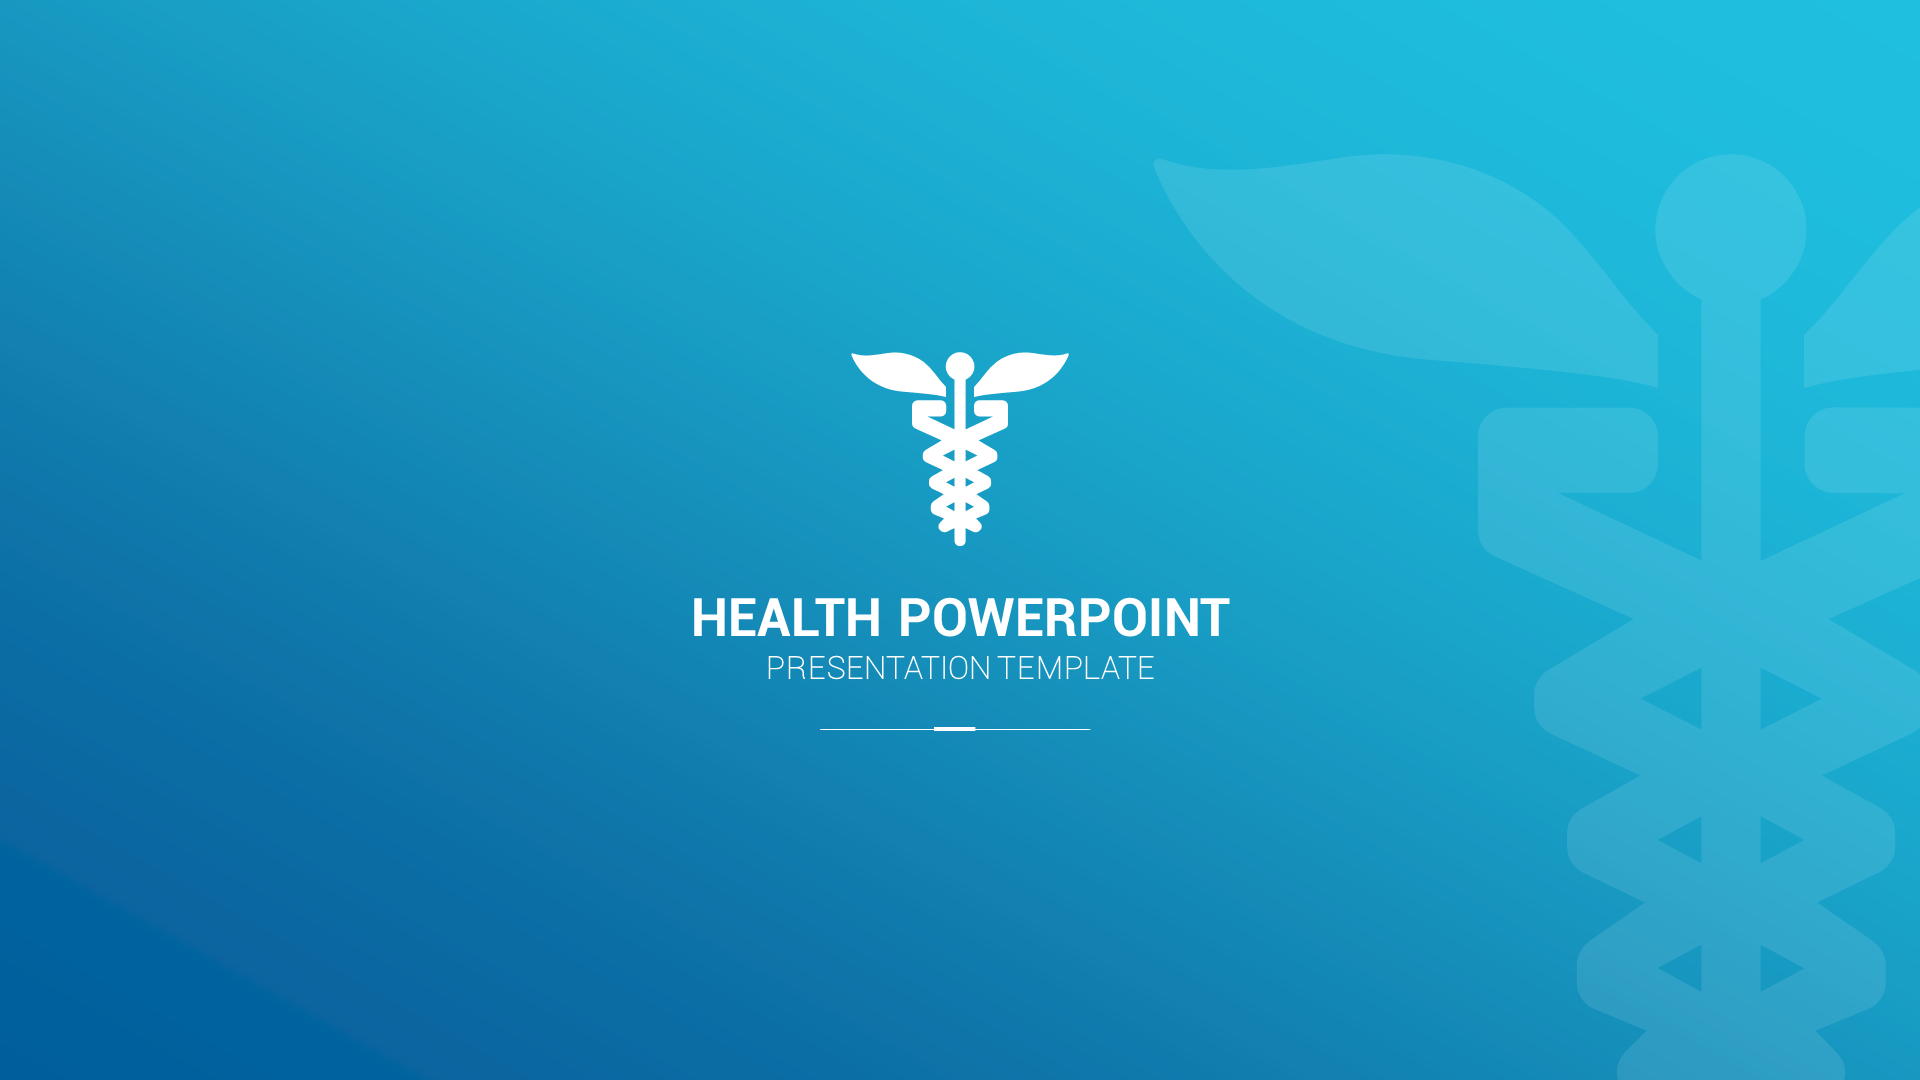 1. Health PowerPoint Presentation Template